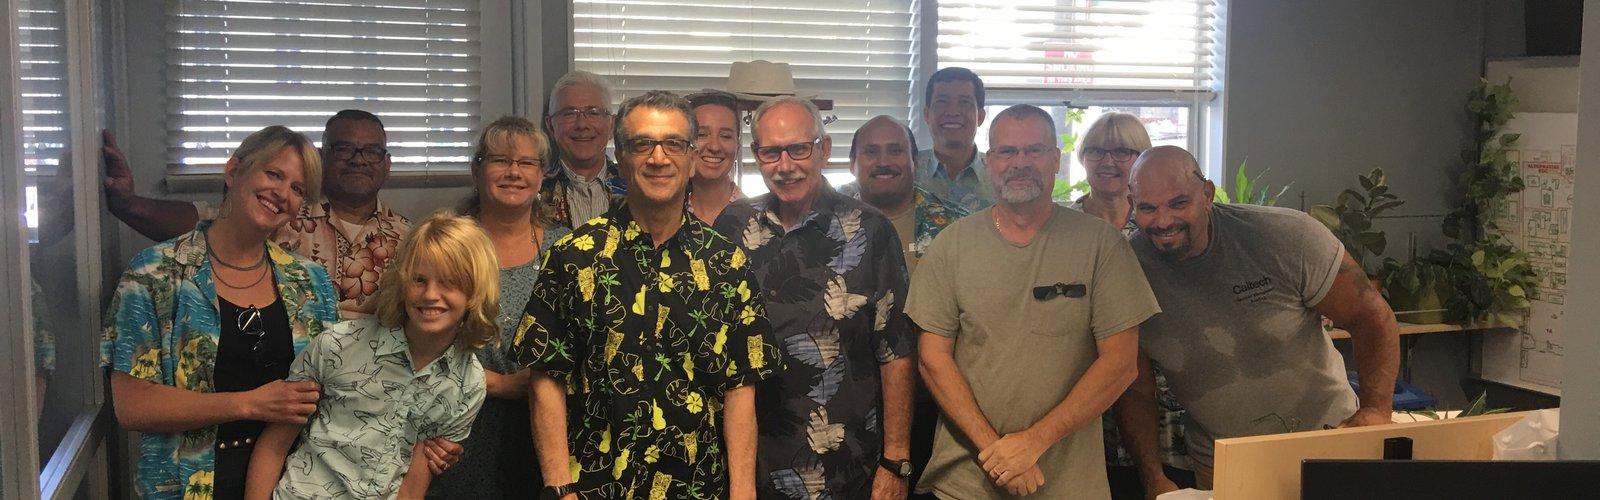 office birthday party goers wear Hawaiian shirts